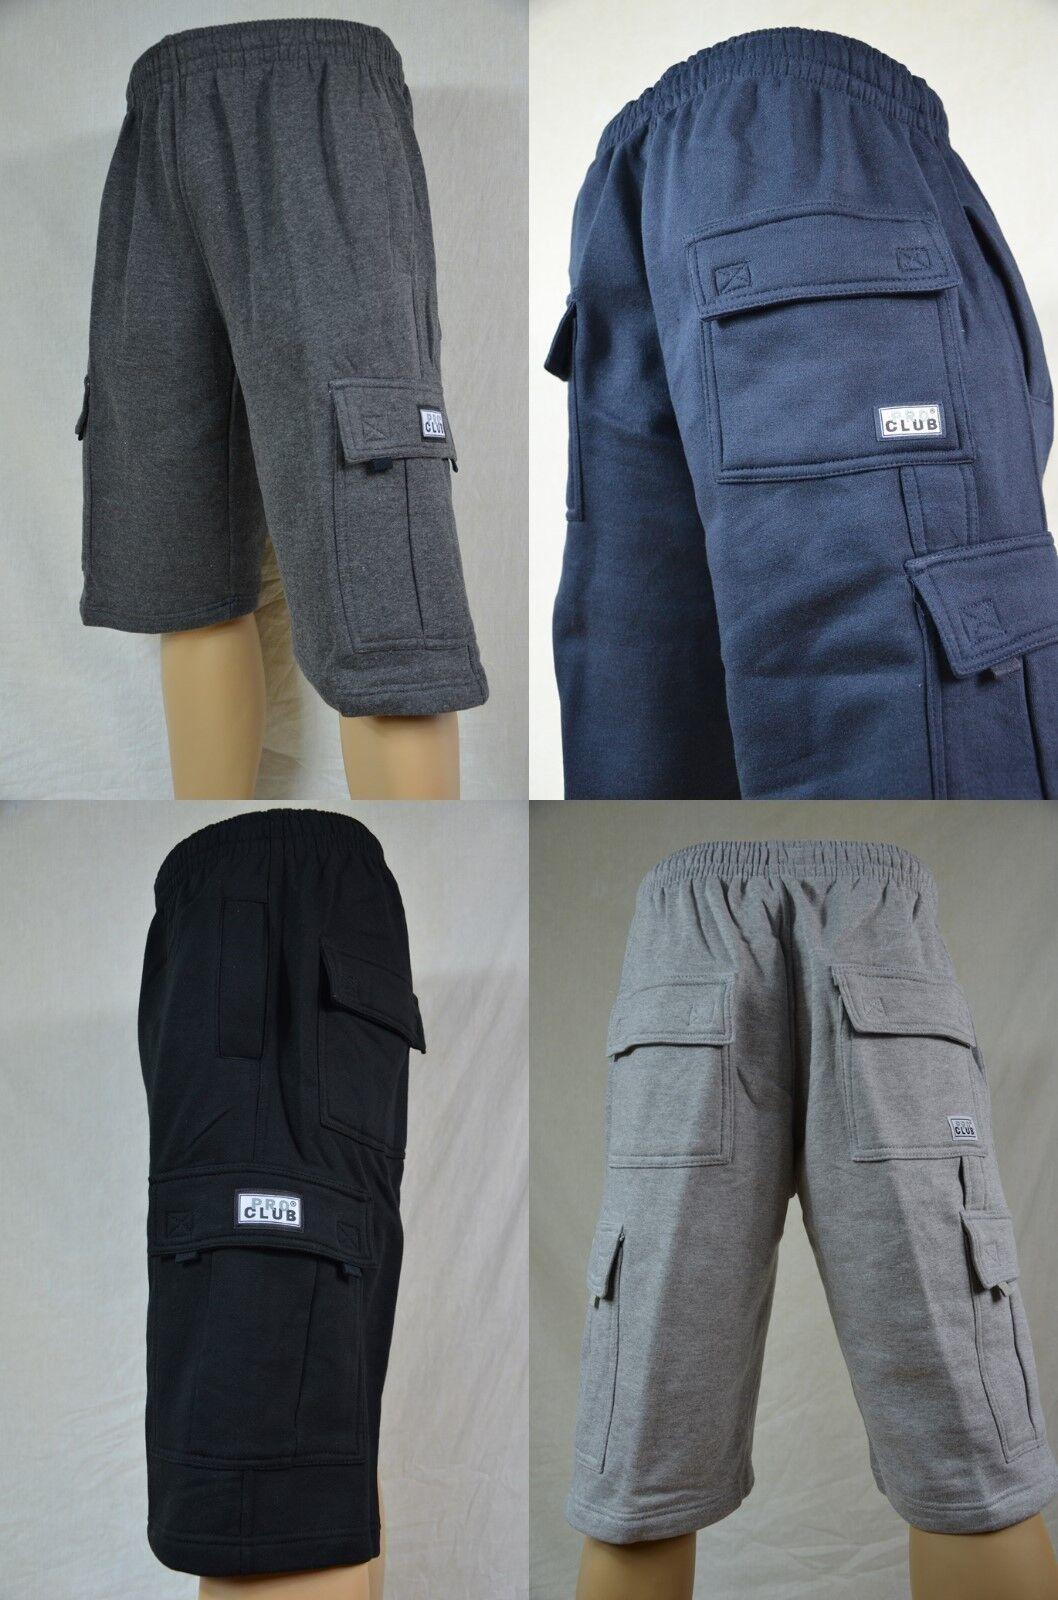 NWT Pro Club Heavy Weight Fleece Cargo Shorts Mens Sweatpant